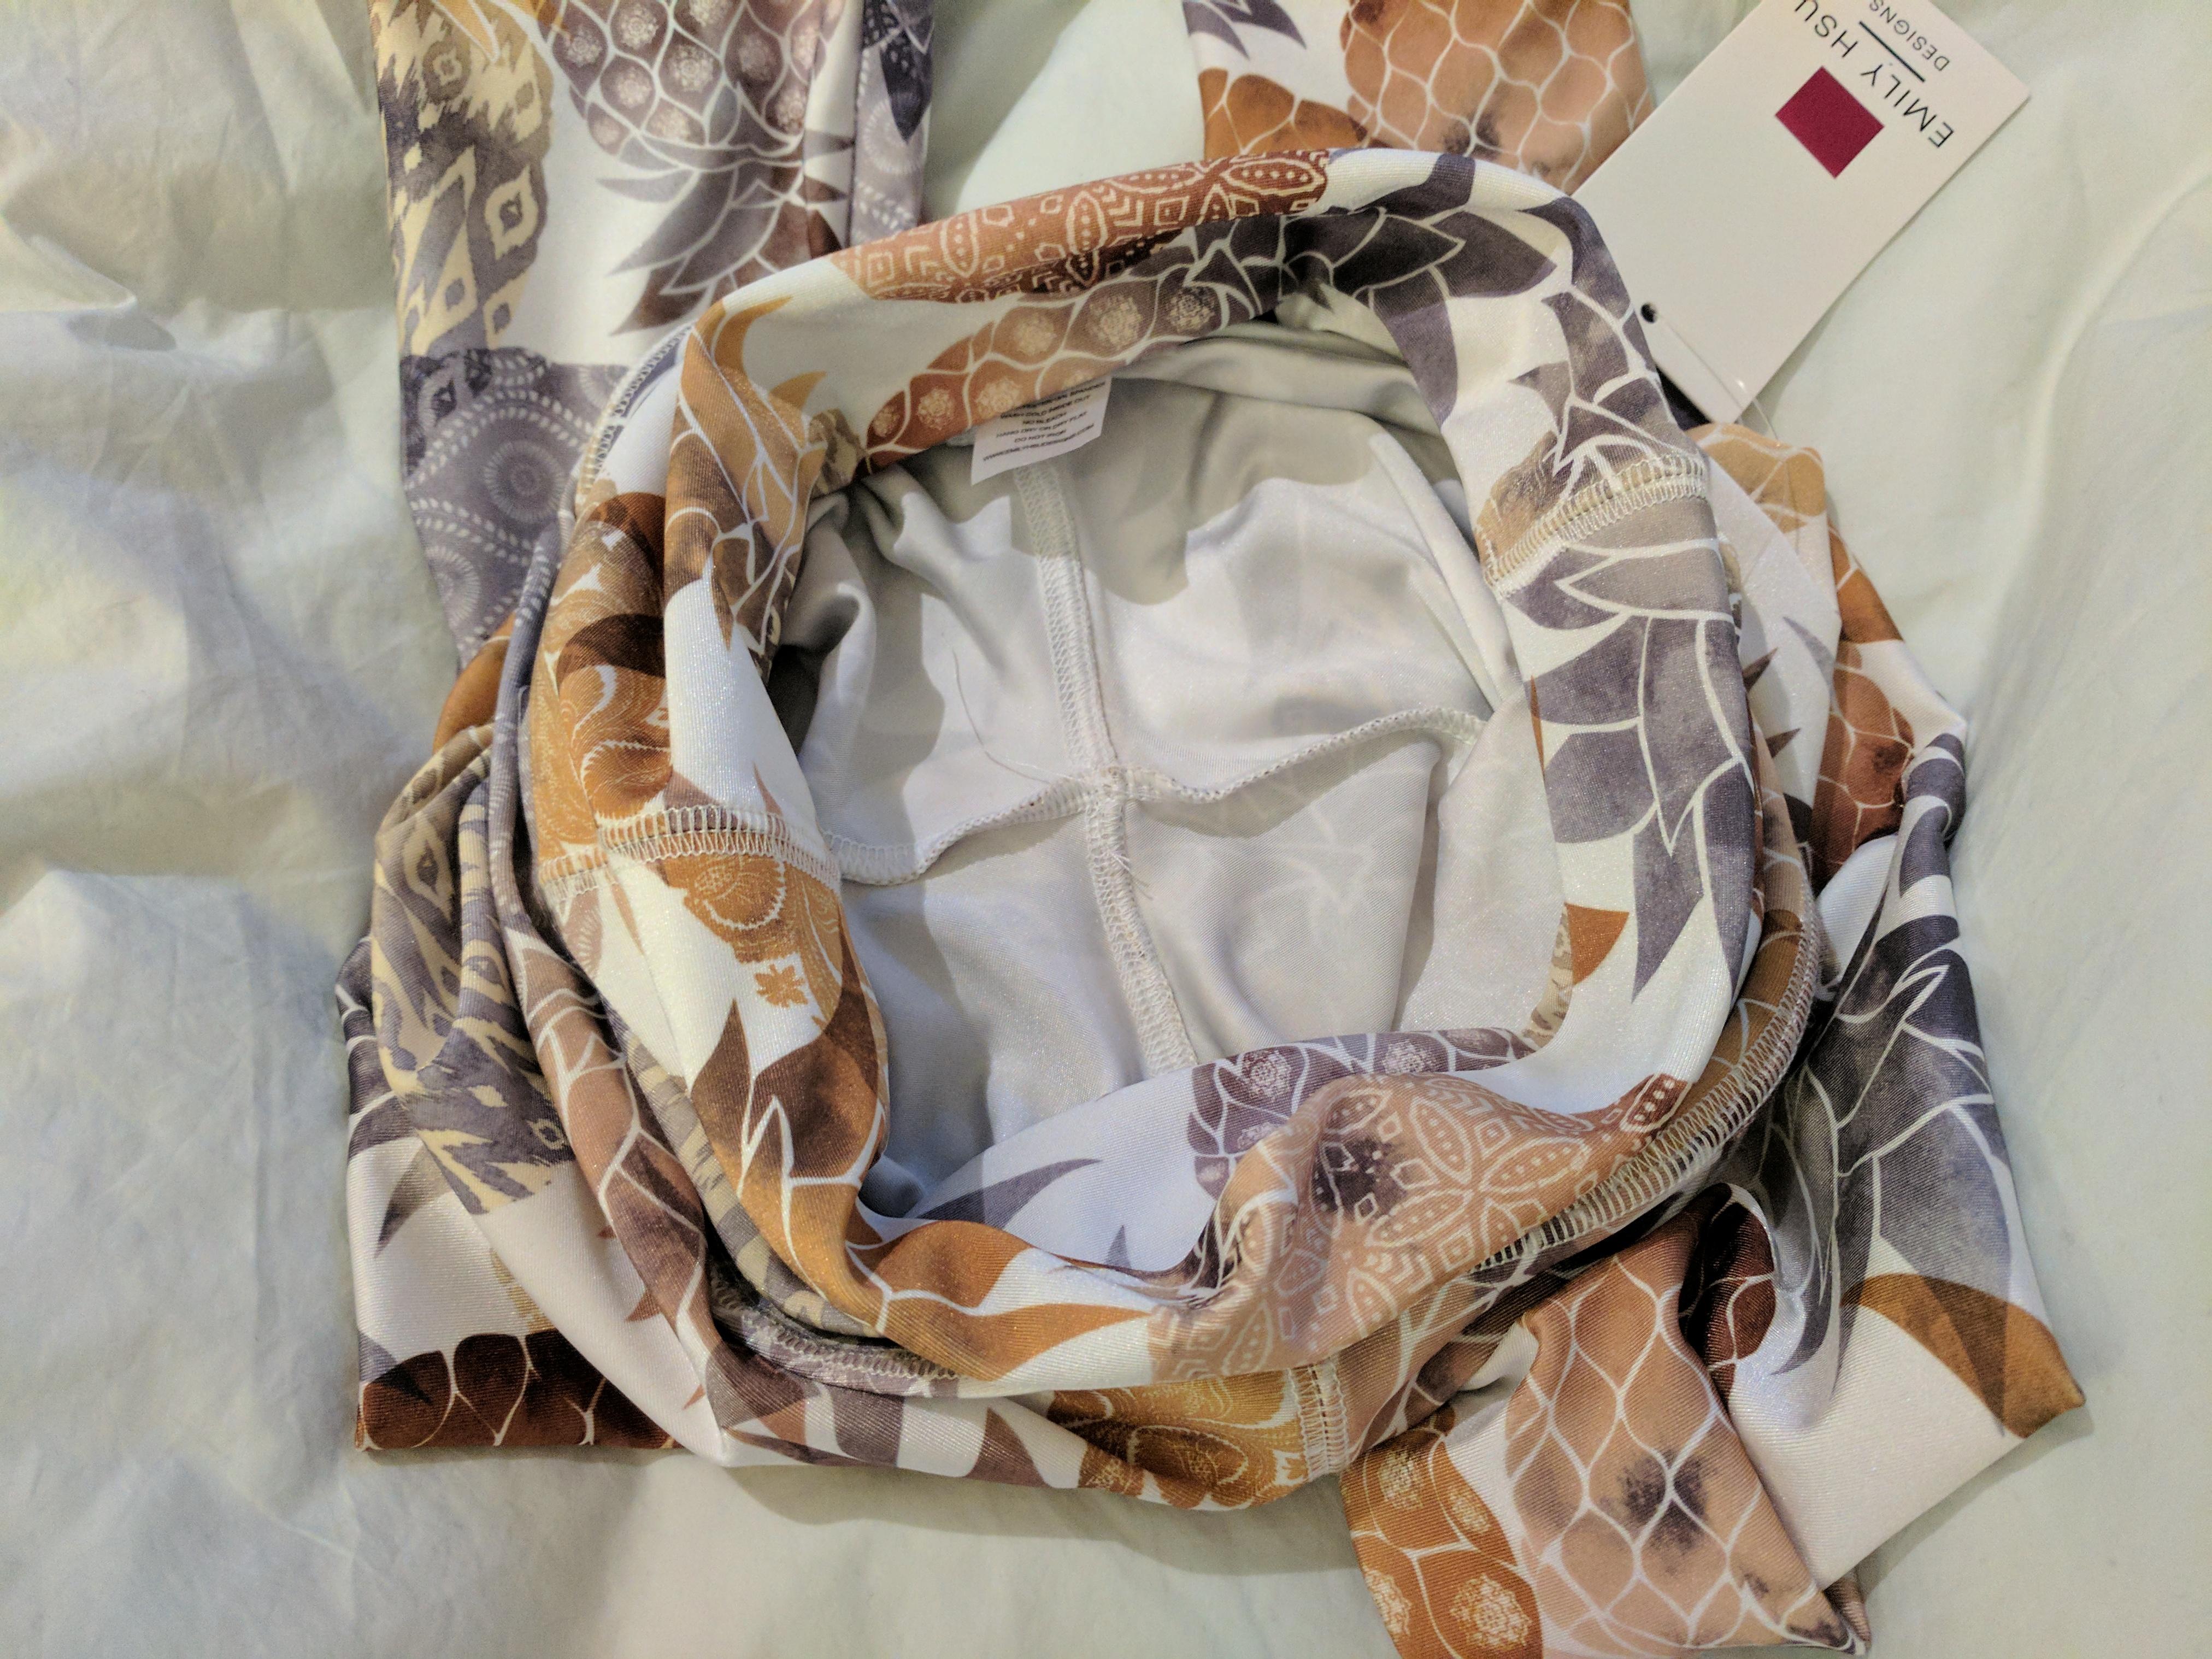 emily-hsu-designs-pineapple-leggings-gusset-seam